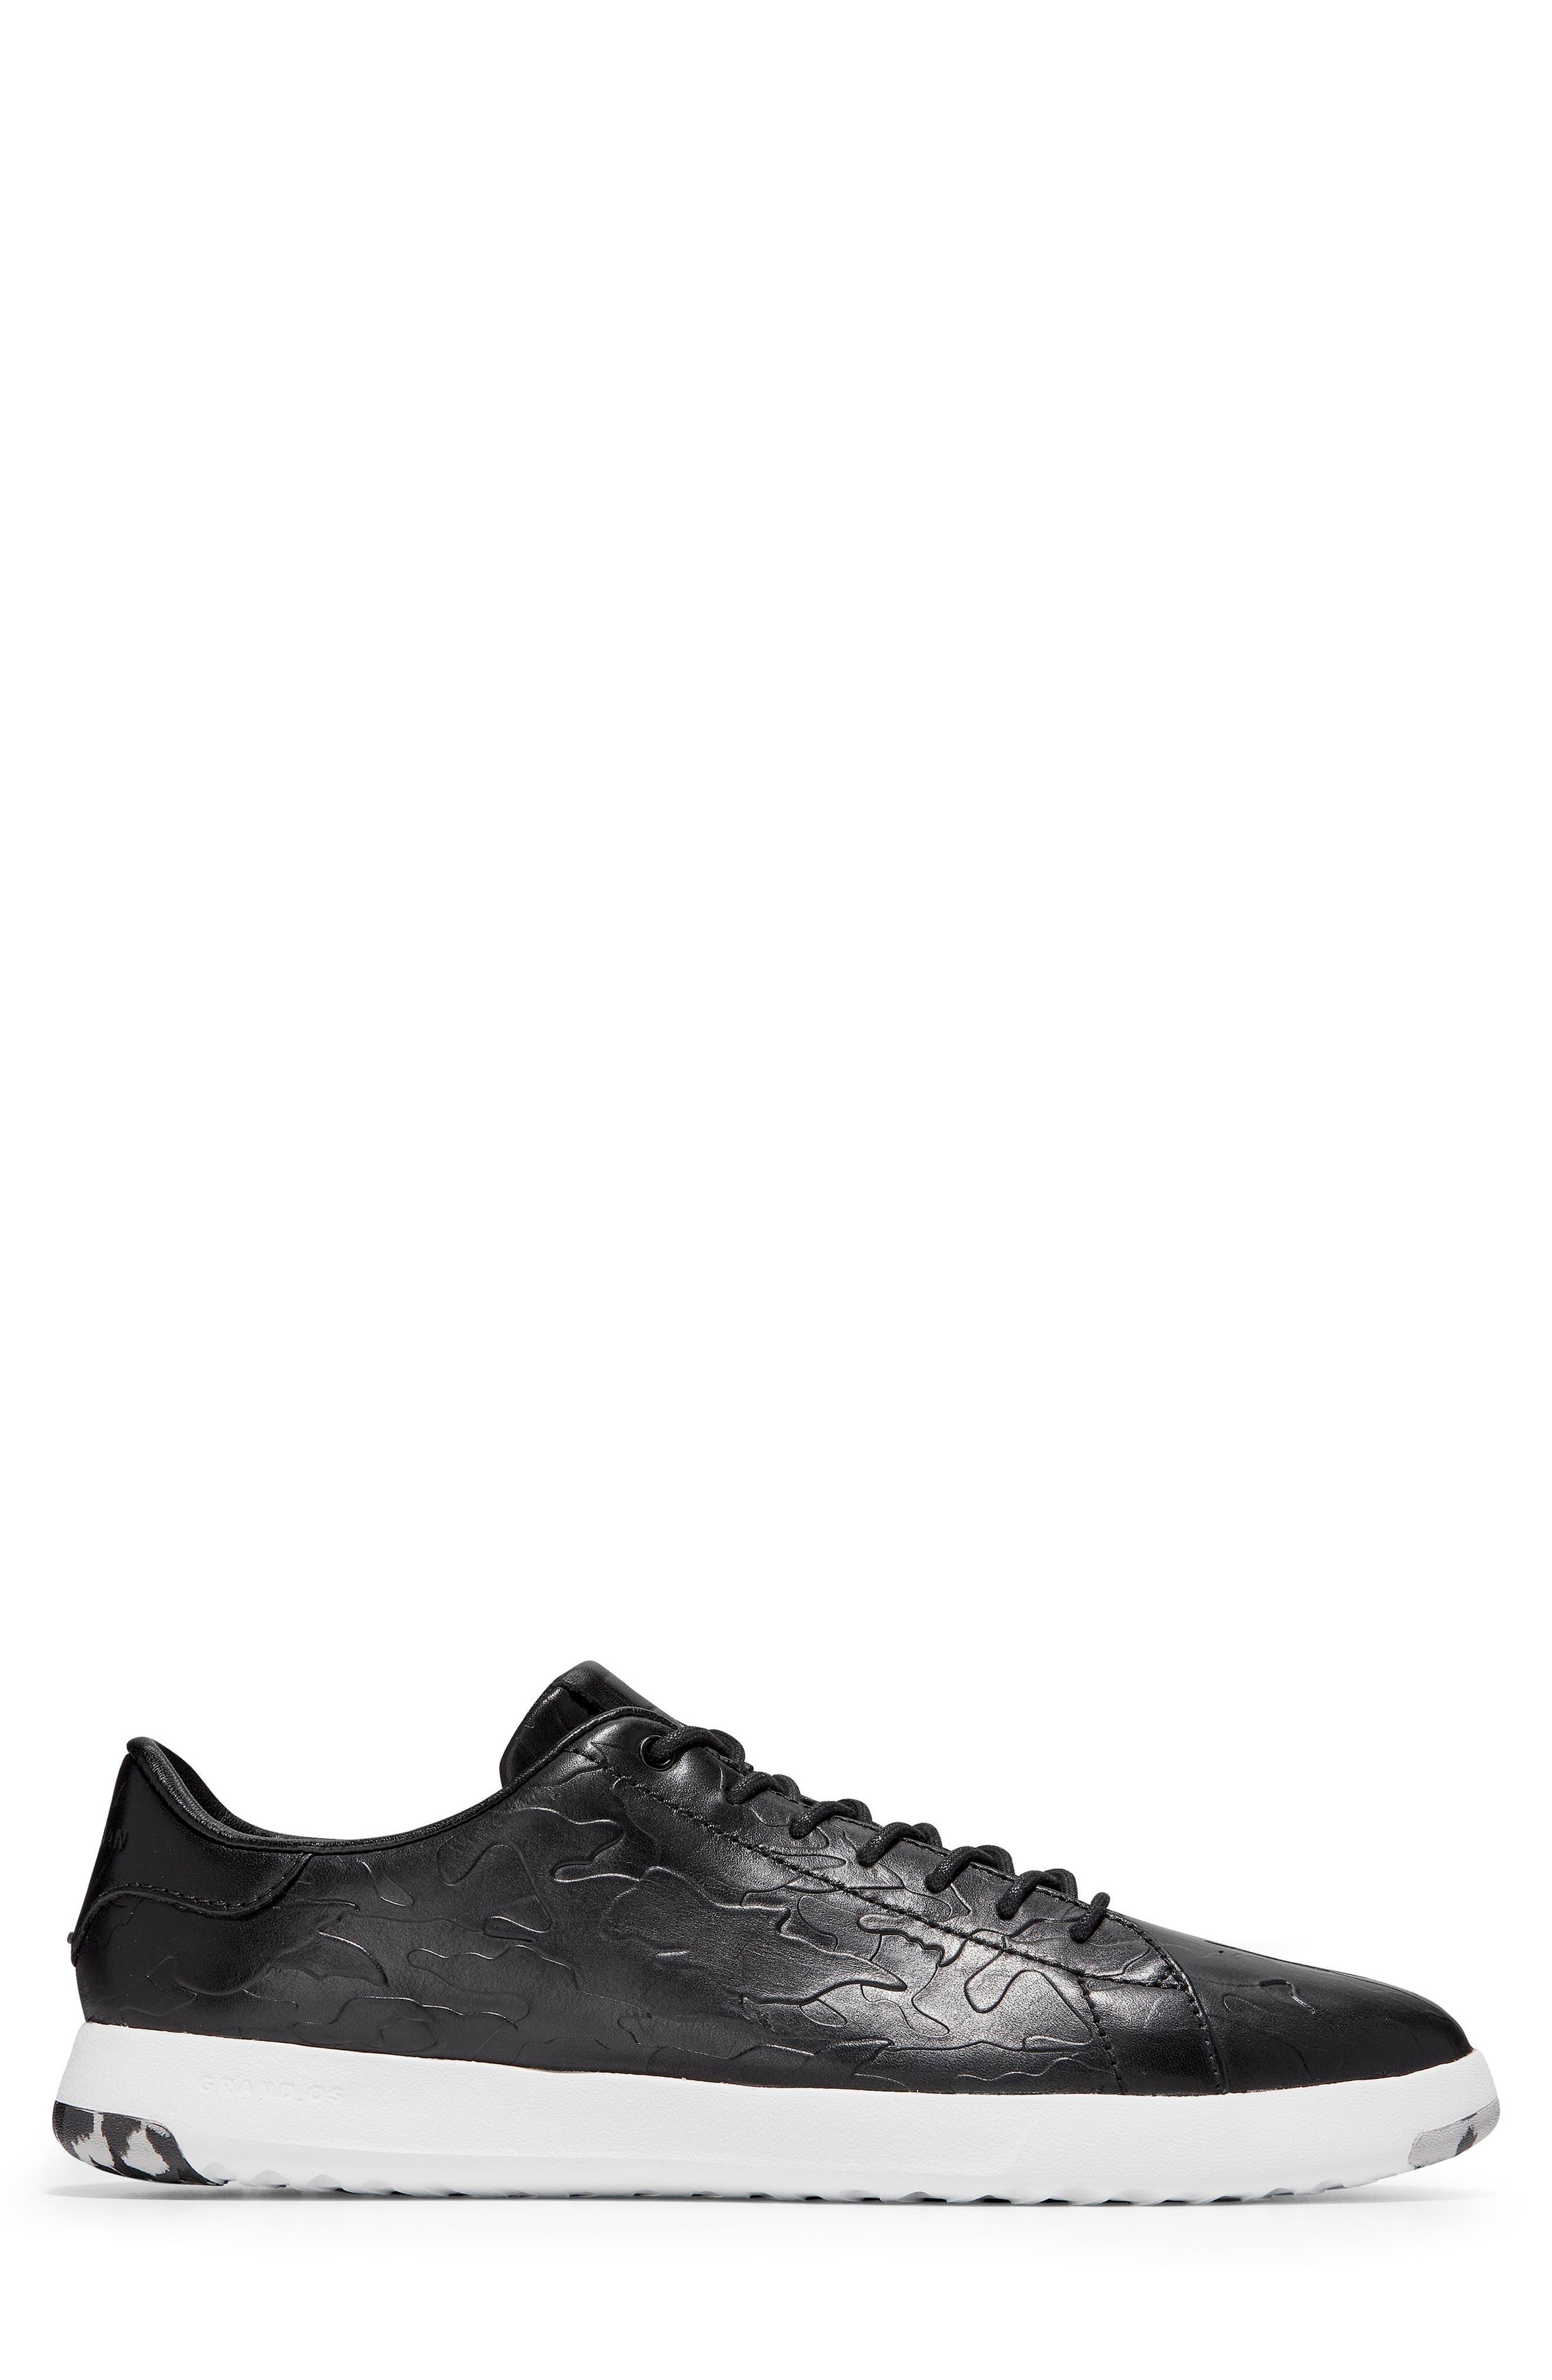 GrandPro Tennis Sneaker,                             Alternate thumbnail 3, color,                             BLACK/ CAMO LEATHER